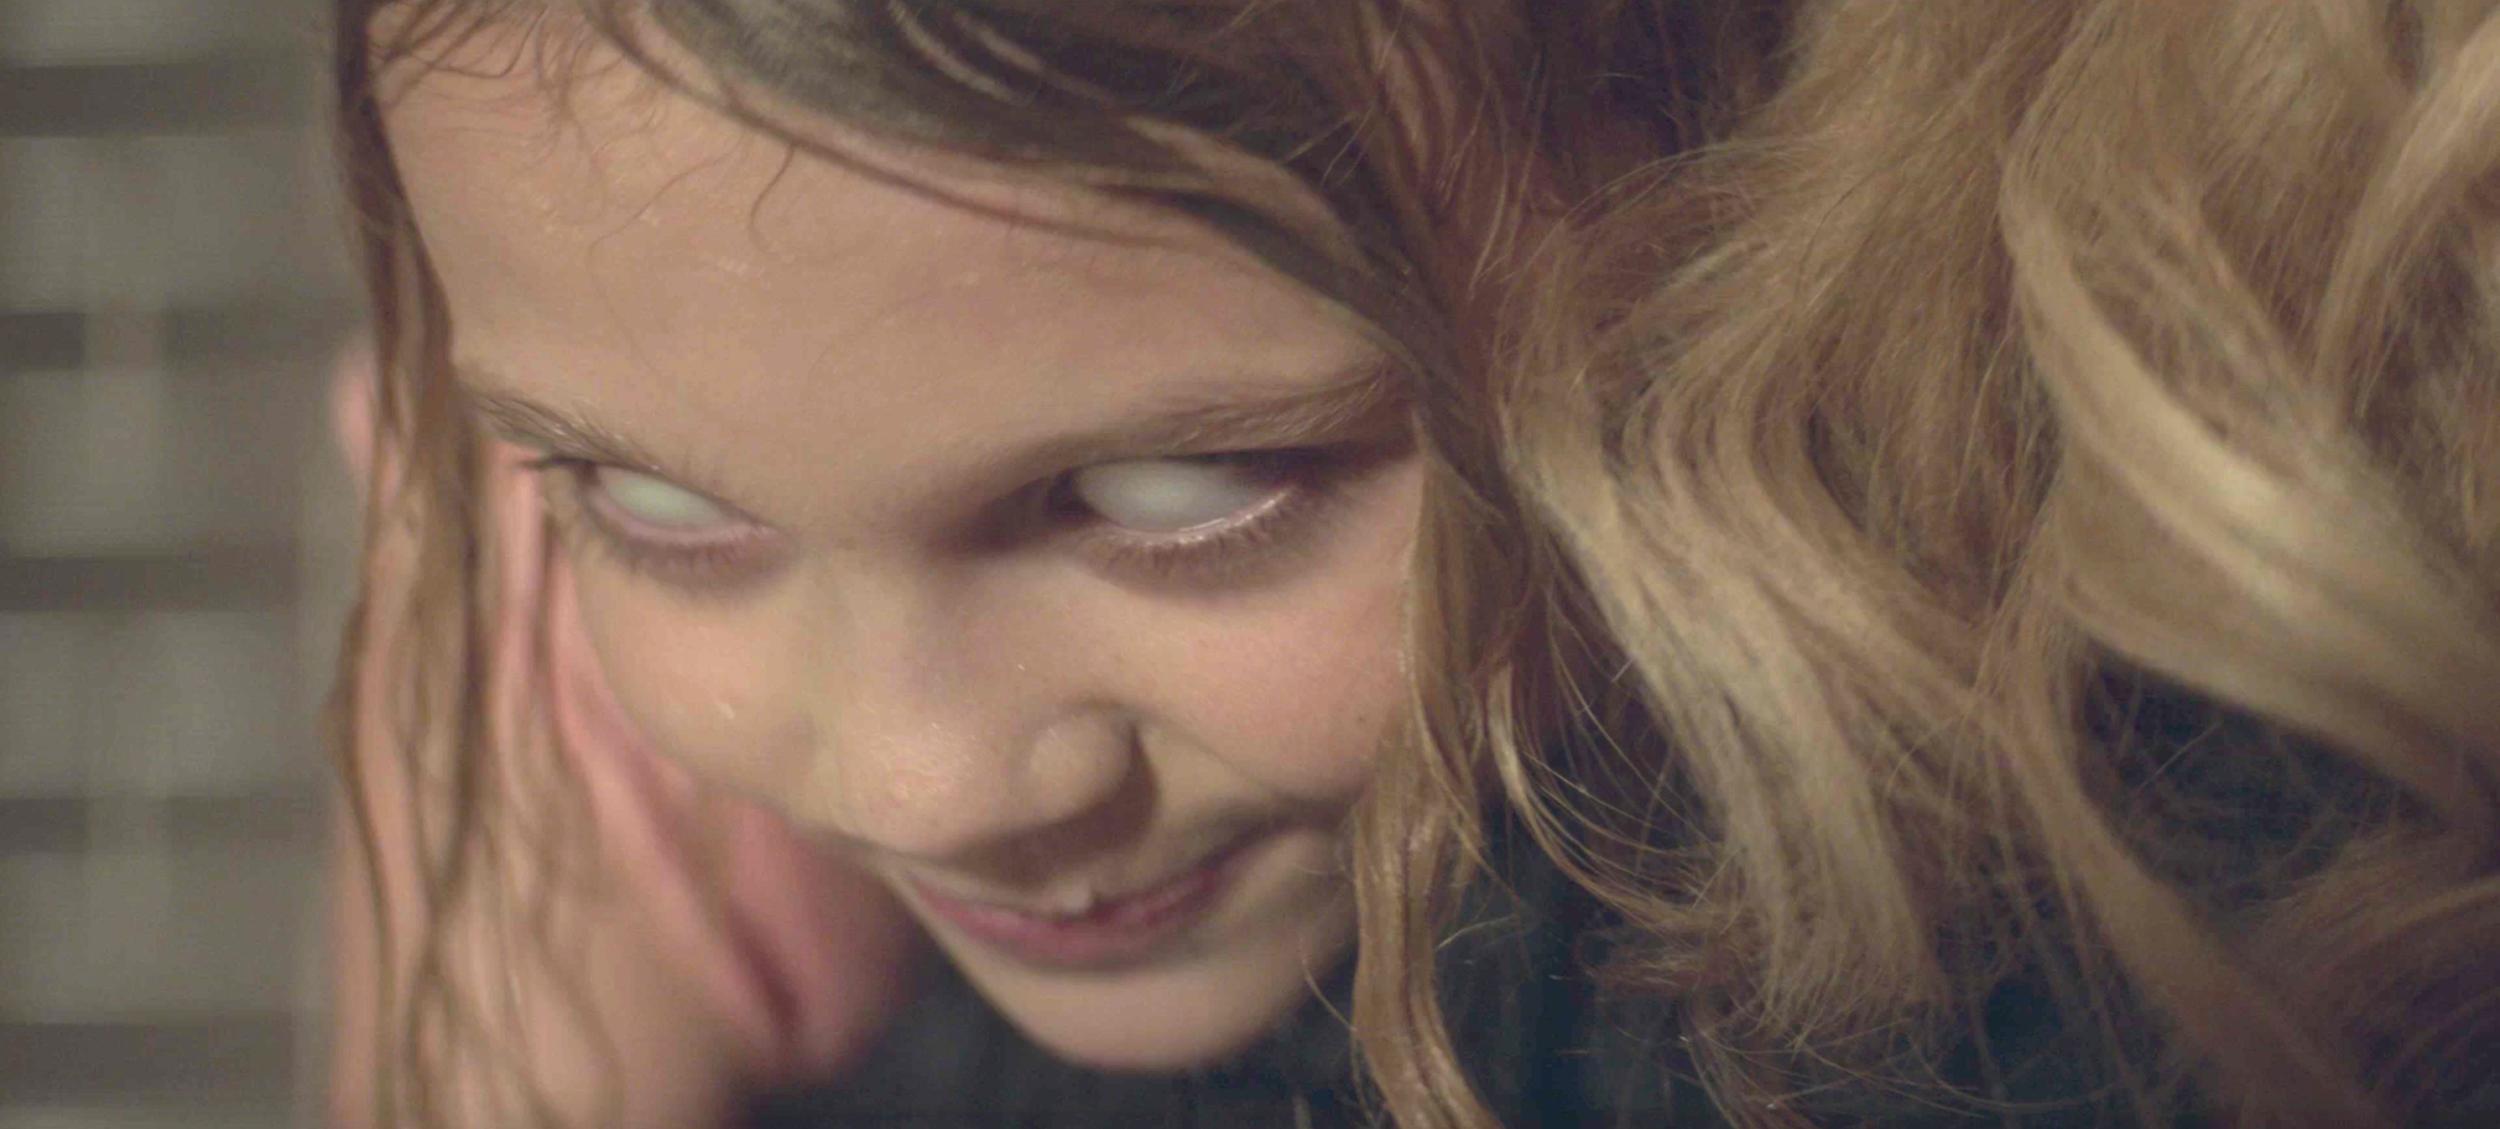 Milky white eyes absent pupils and devilish little smile, yup, she's possessed!